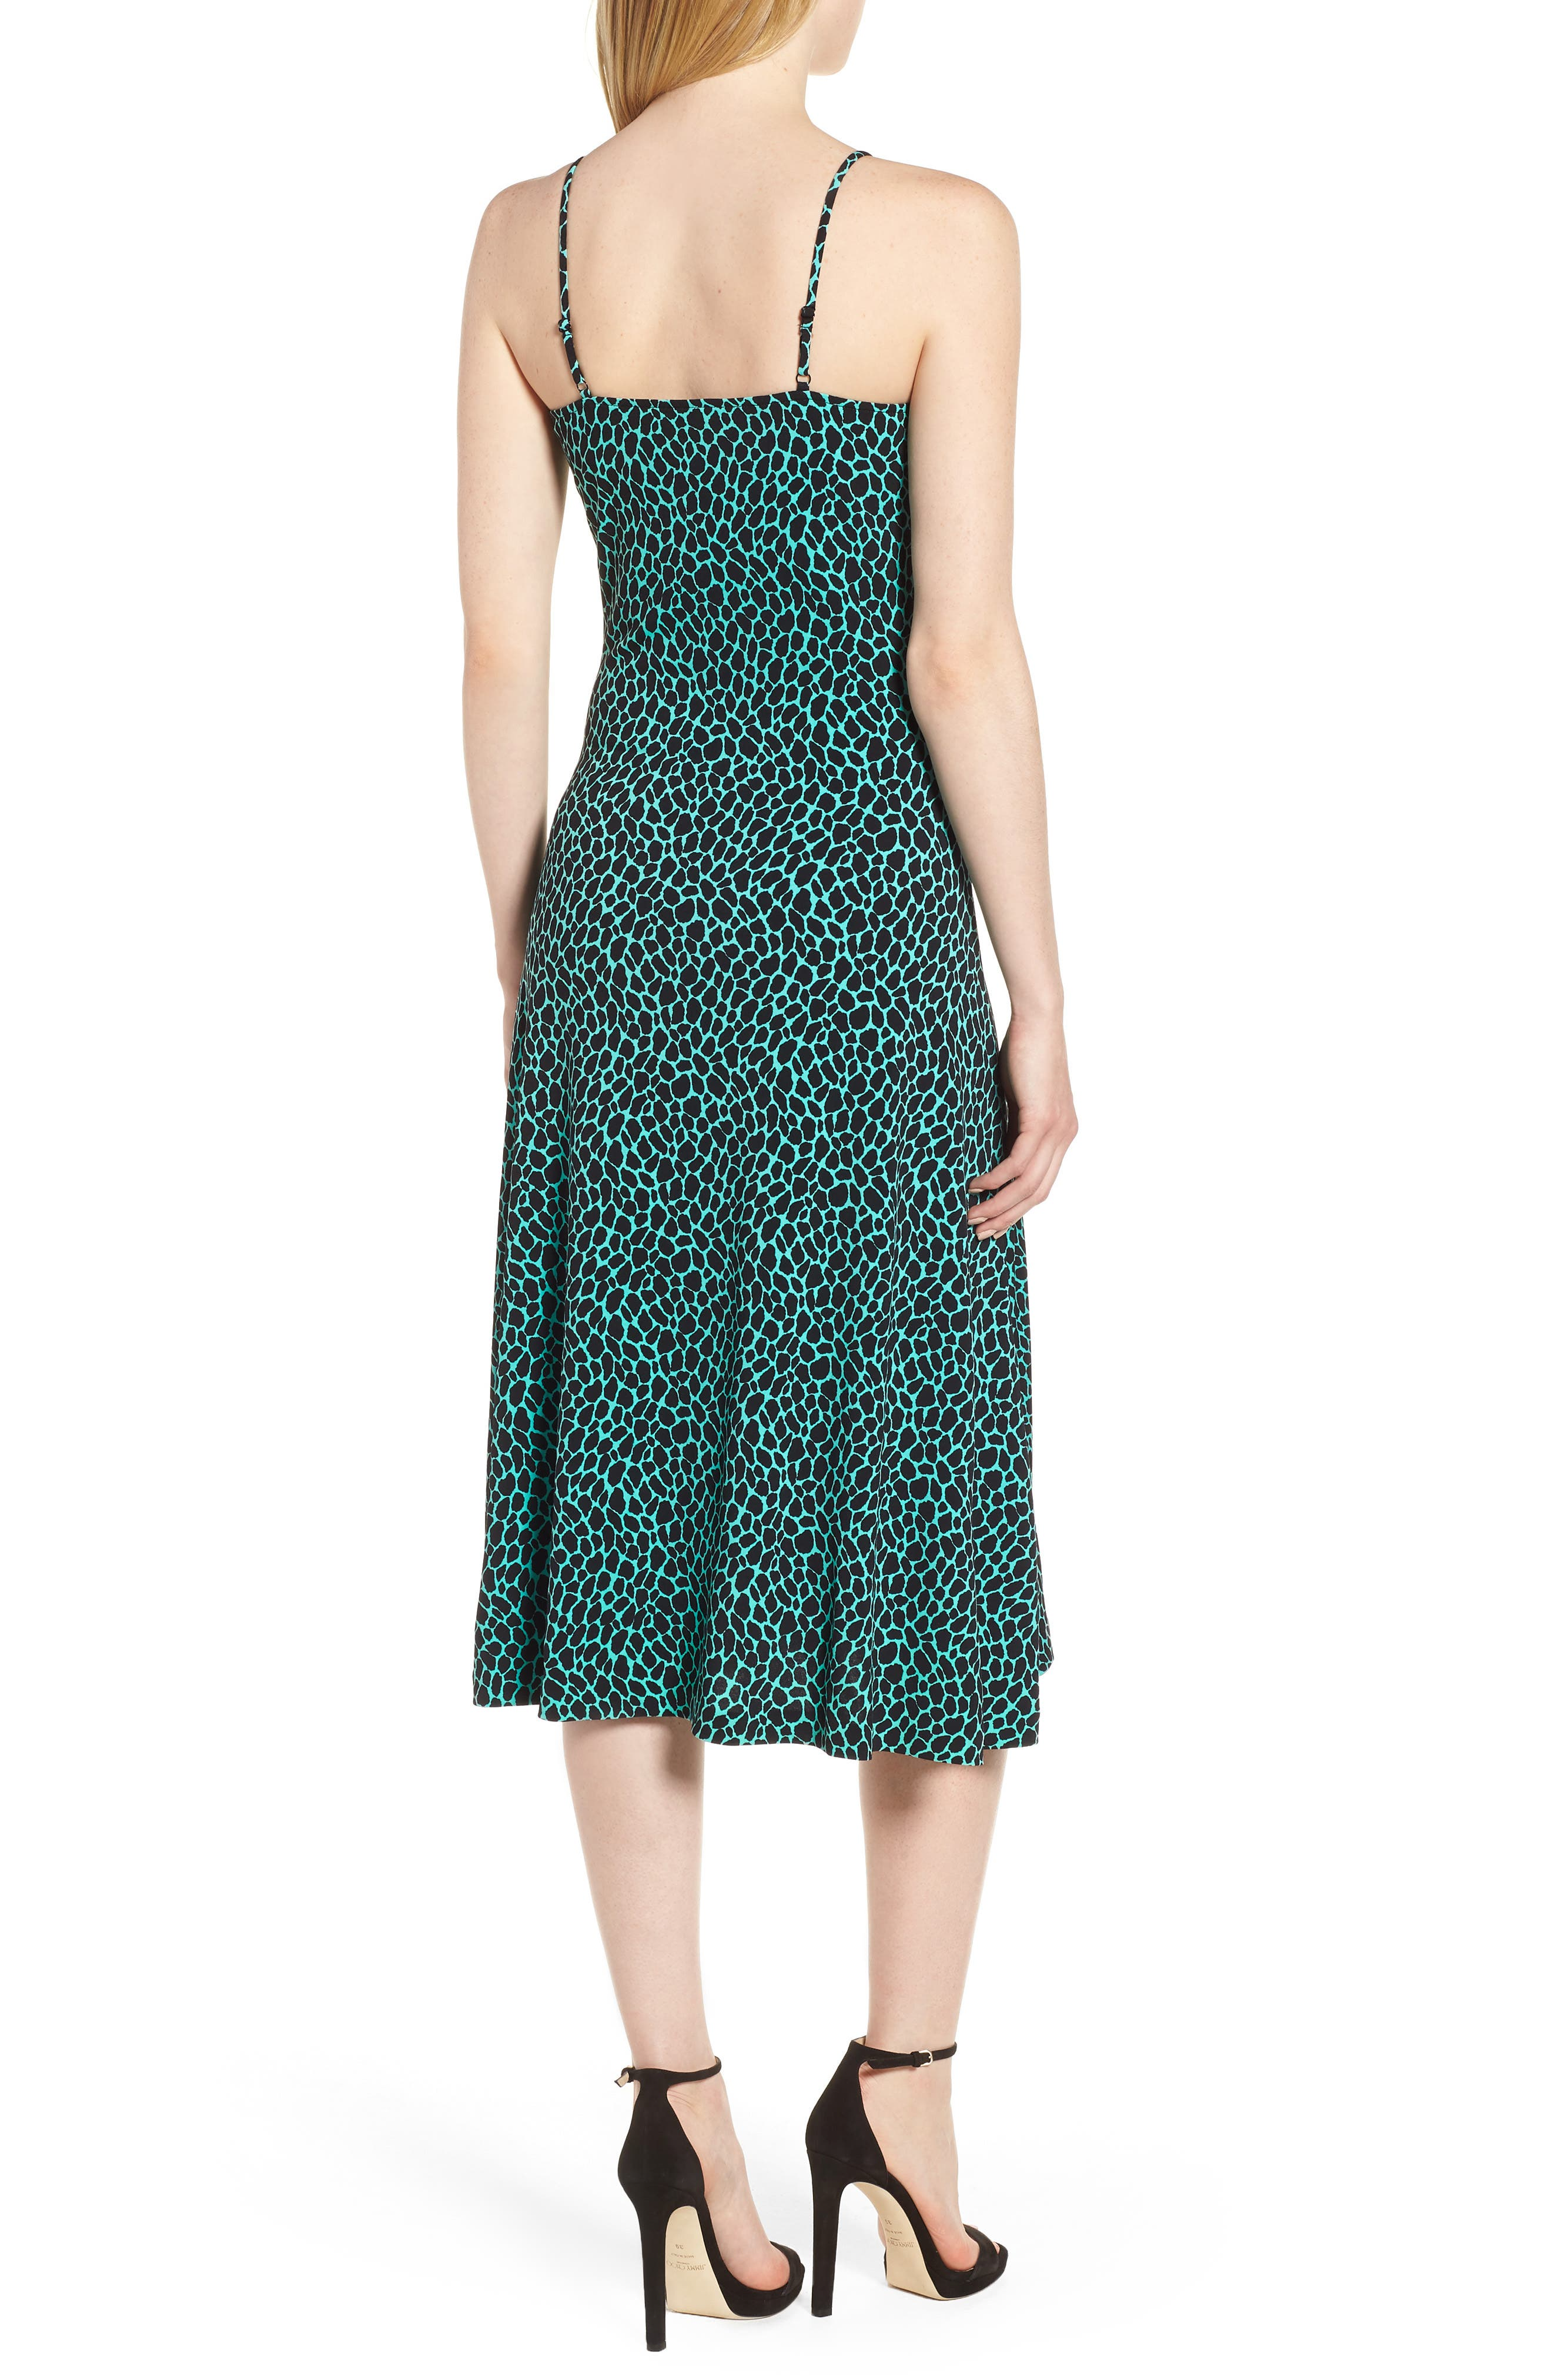 Graphic Leopard Tank Midi Dress,                             Alternate thumbnail 2, color,